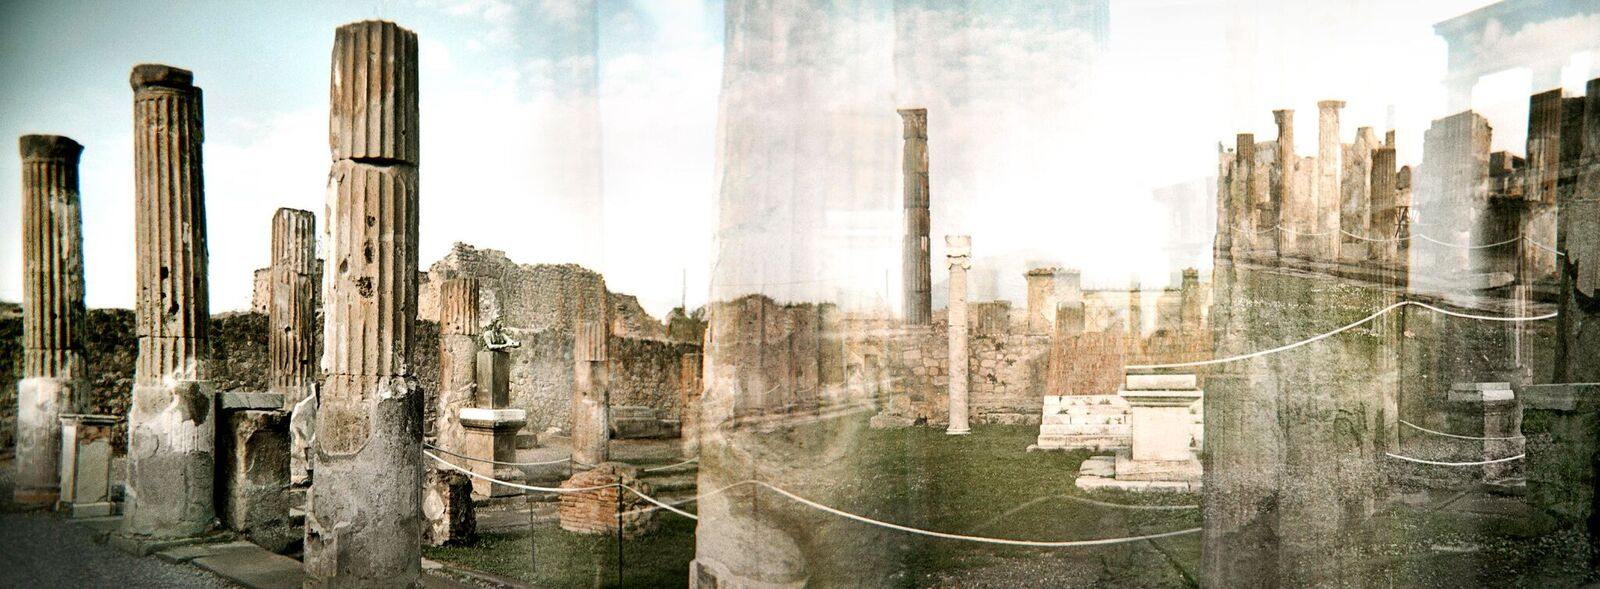 Pompei mese di Agosto preview - Milano Photofestival